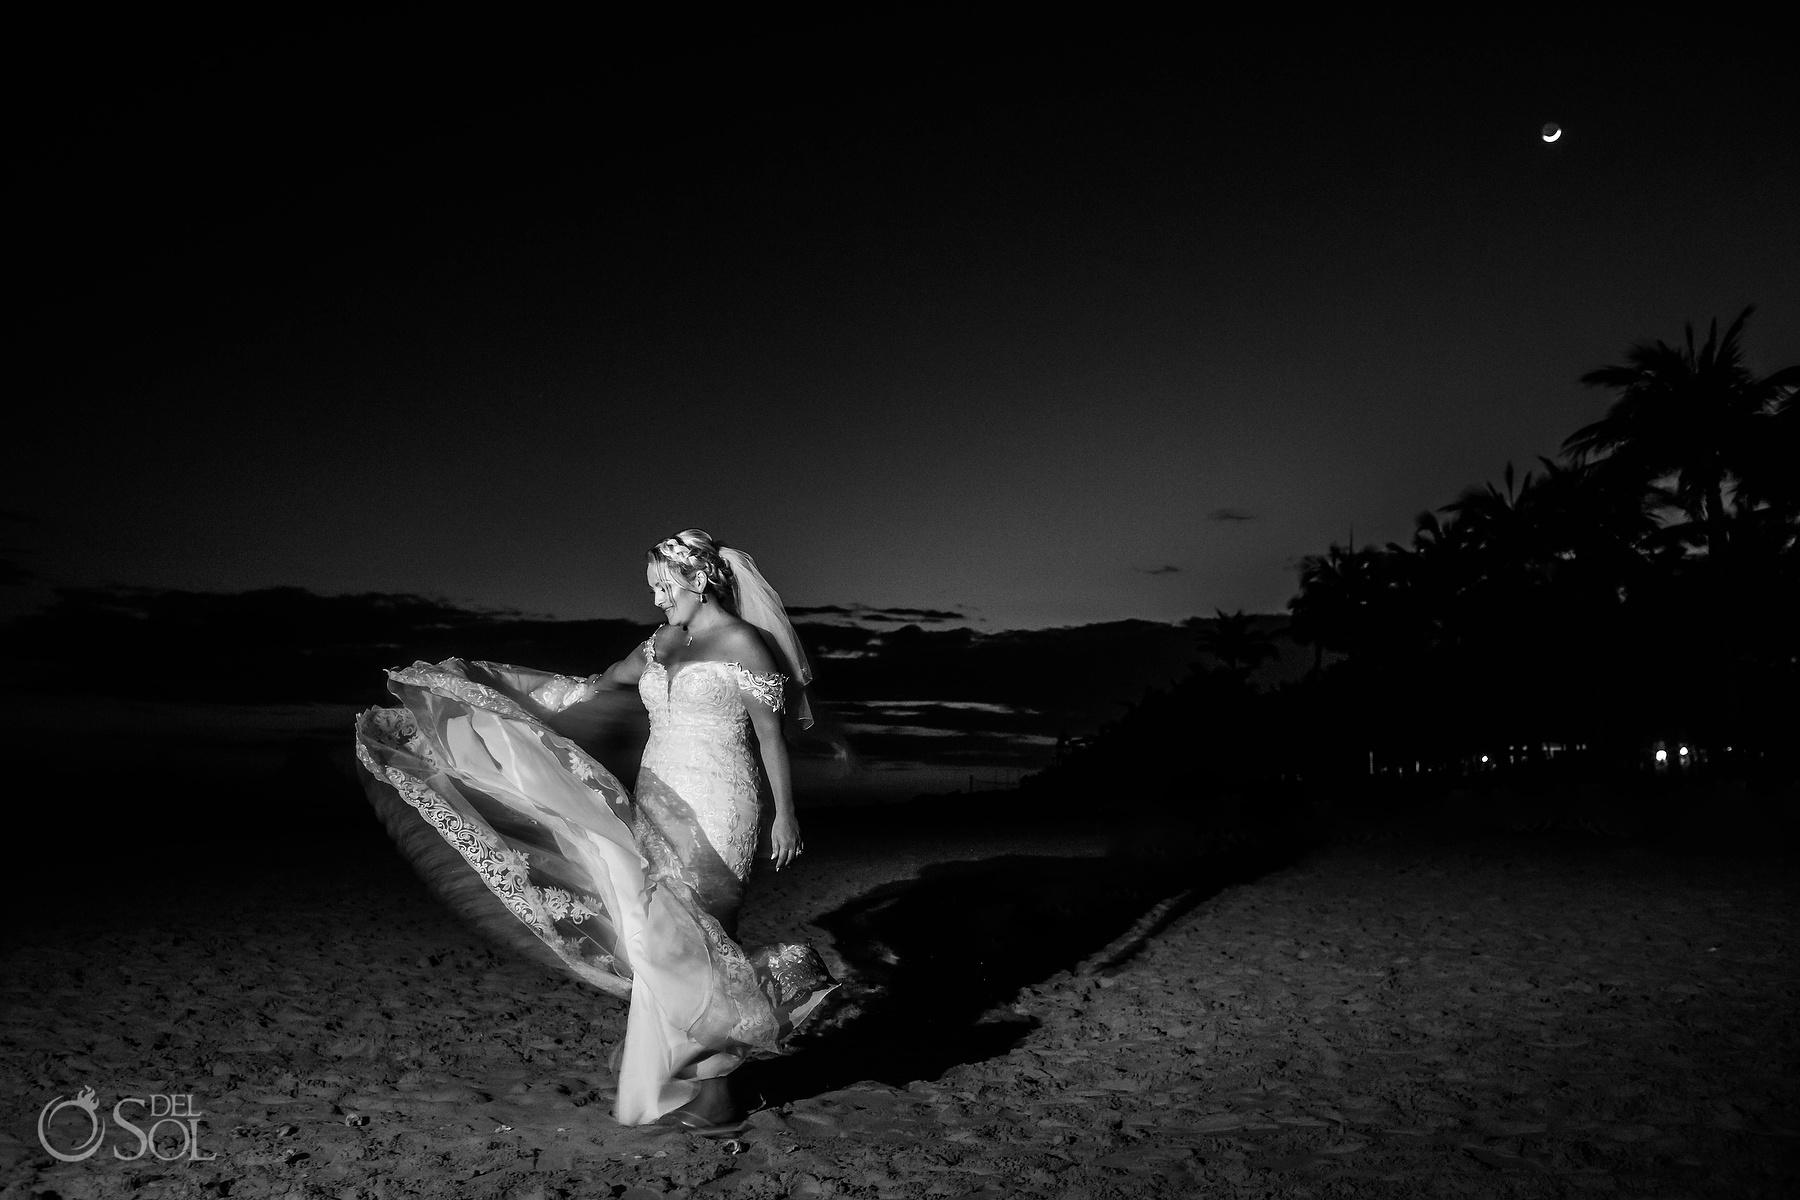 Bride beach night photoshoot with moon at Riu Palace Mexico Wedding Photographer